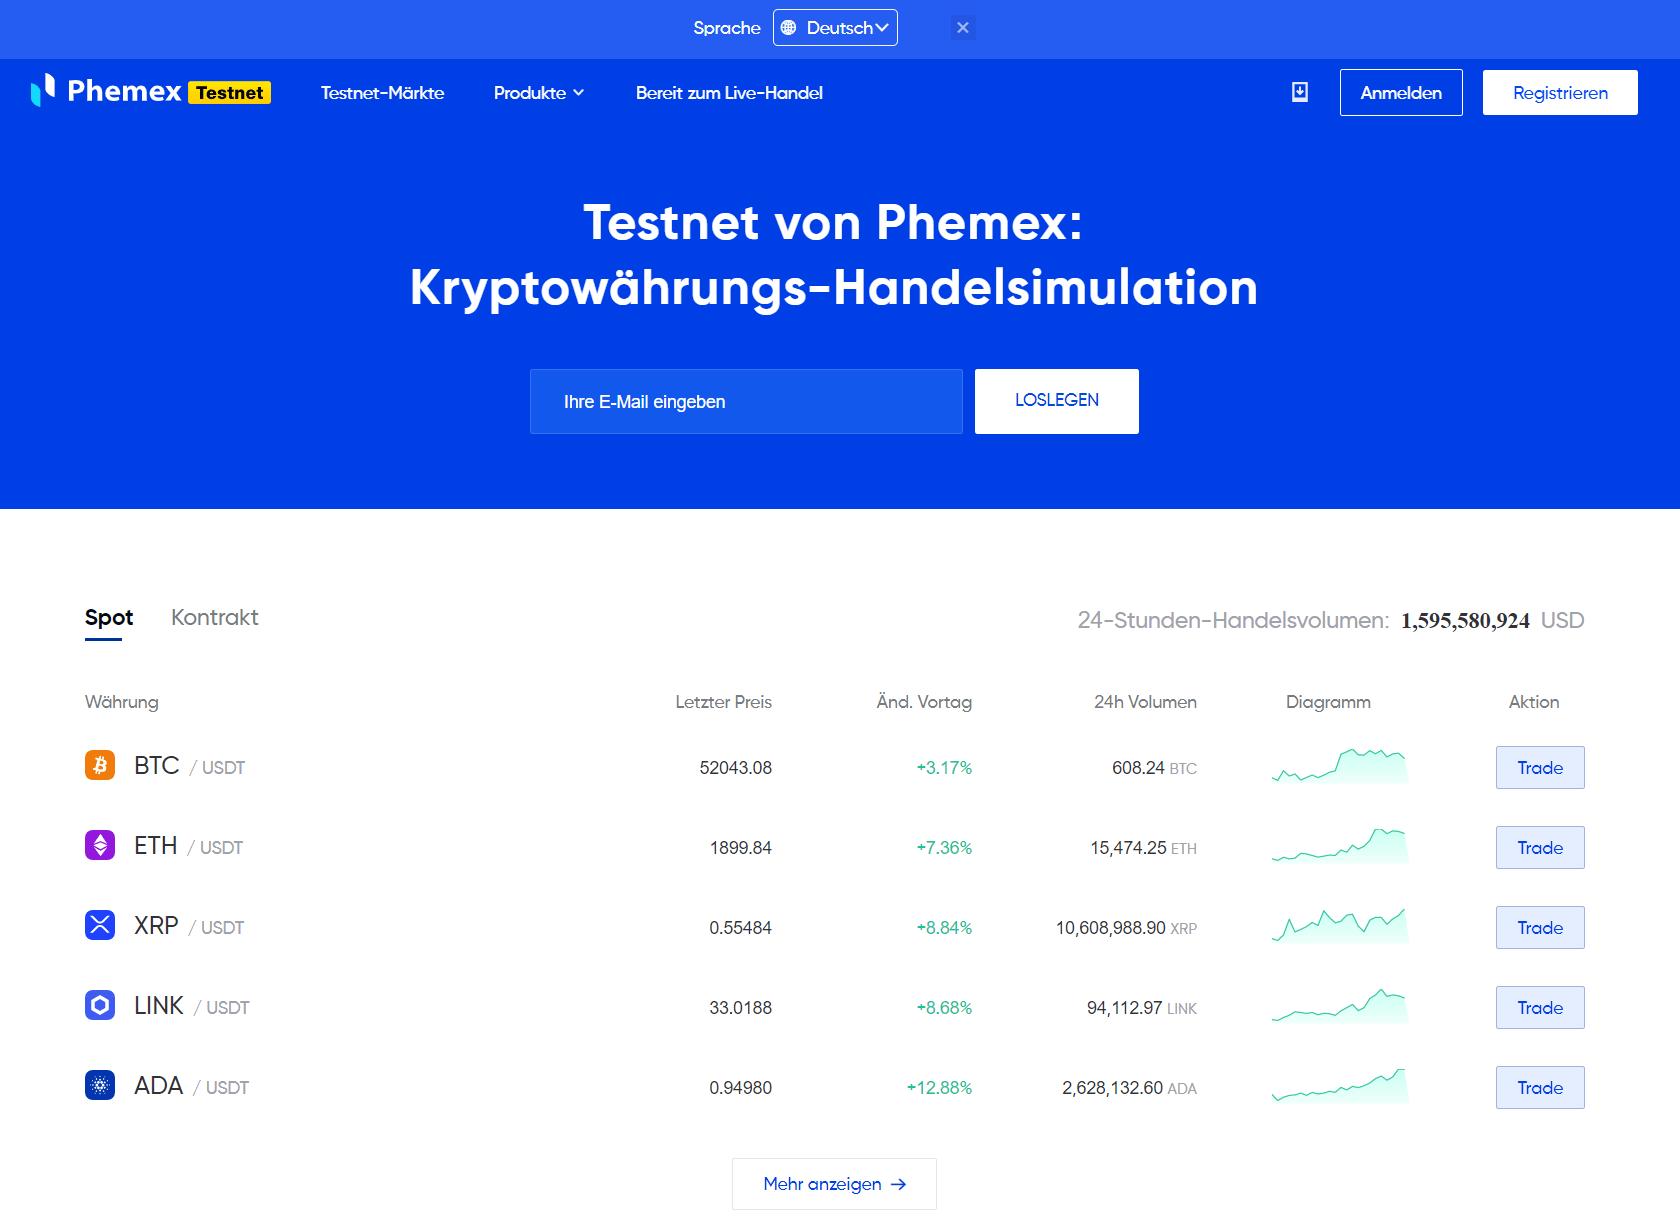 Phemex Testnet